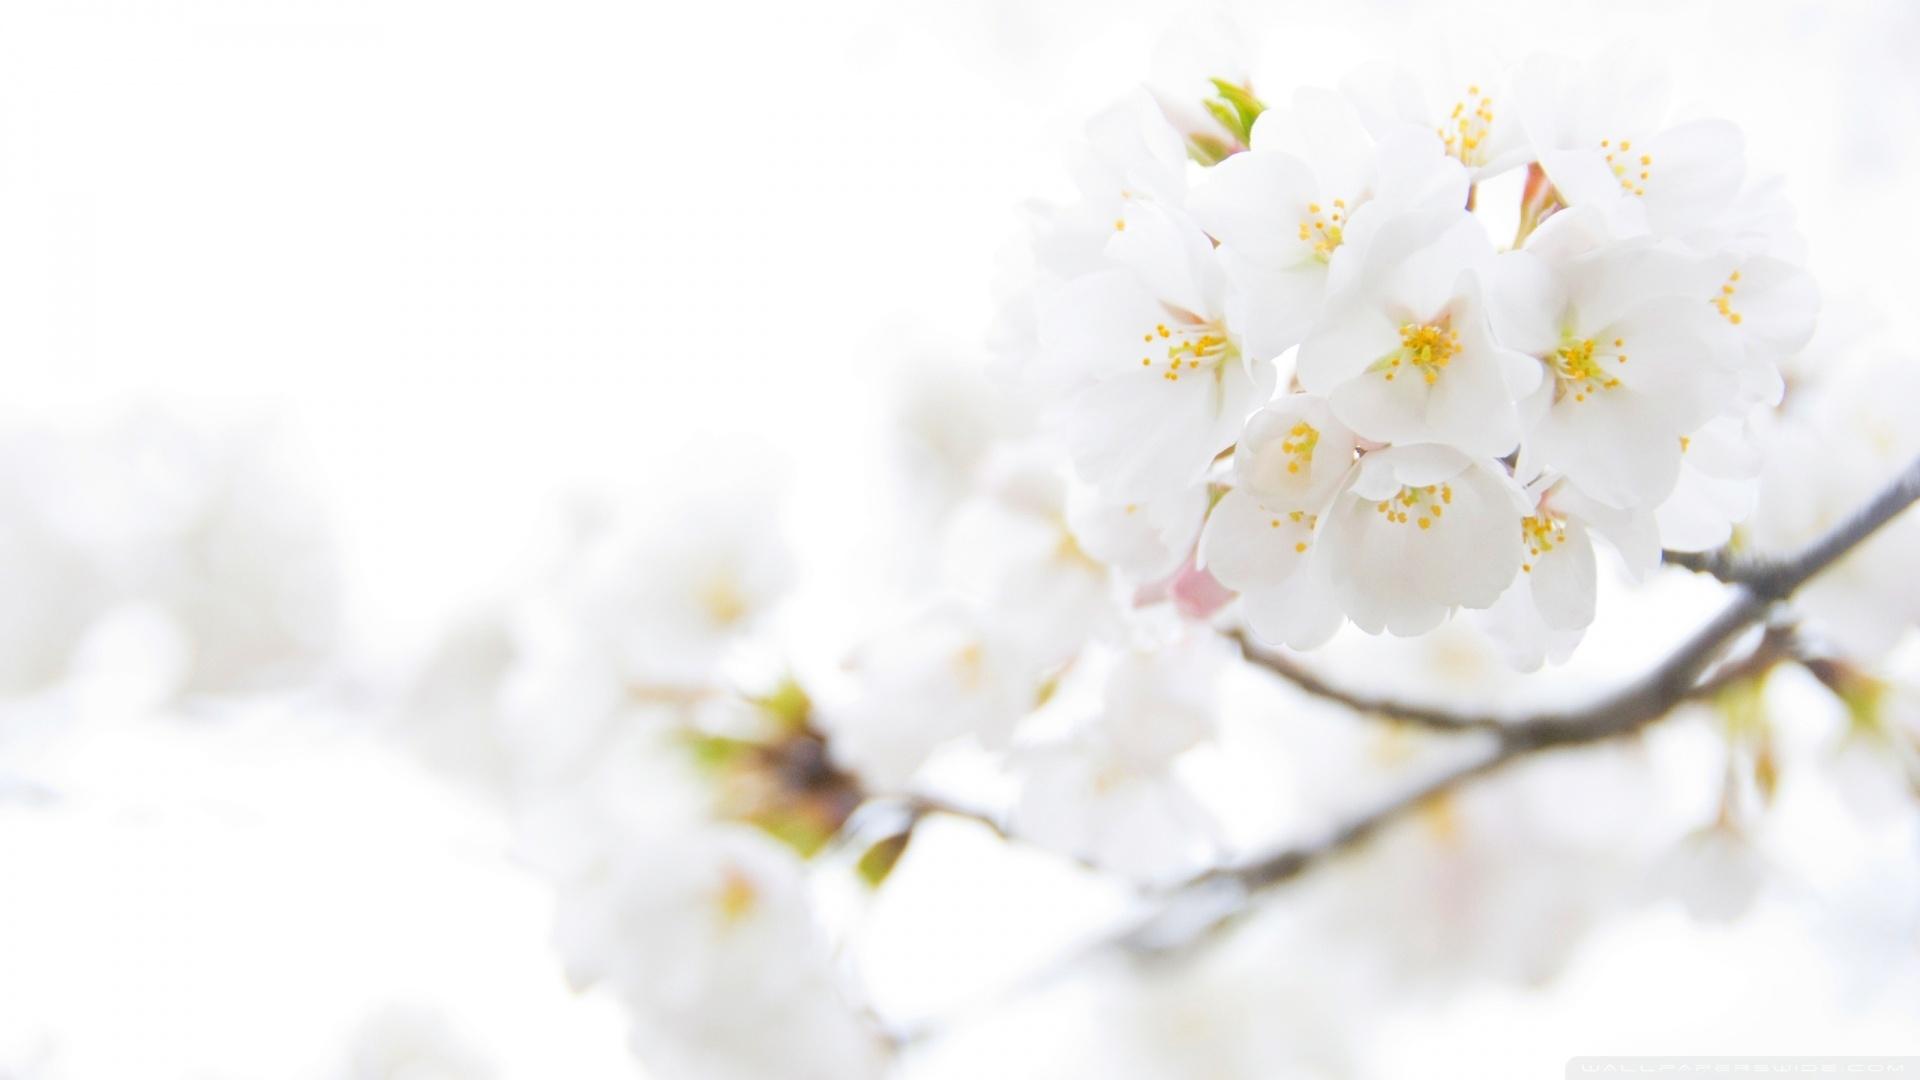 1000+ ideas about White Flower Wallpaper on Pinterest | White